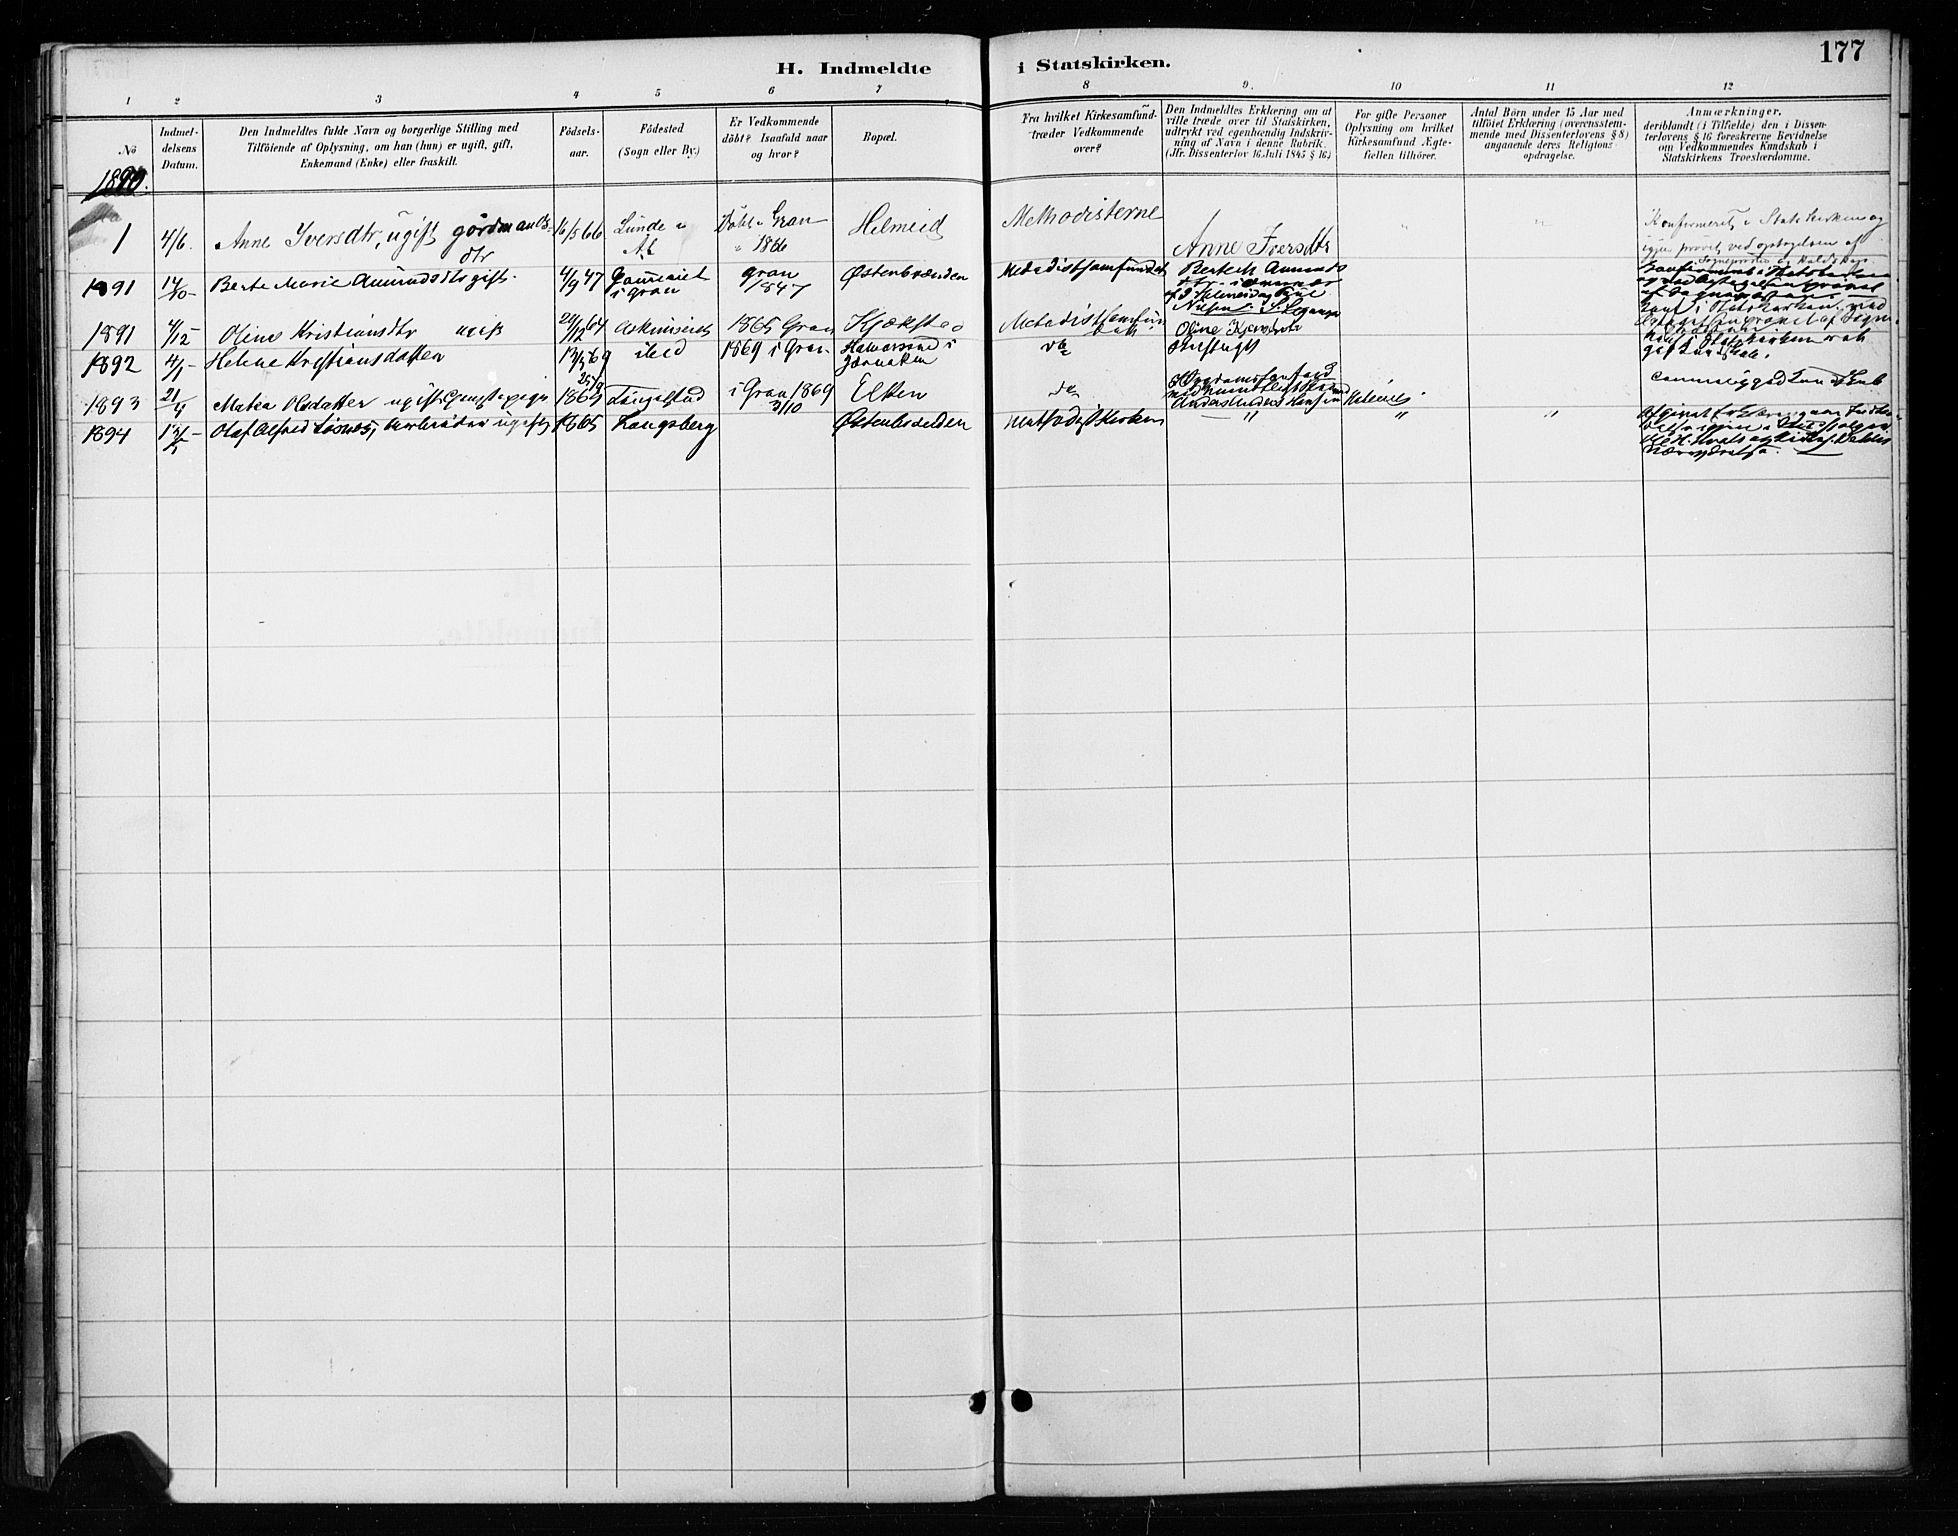 SAH, Gran prestekontor, Ministerialbok nr. 18, 1889-1899, s. 177